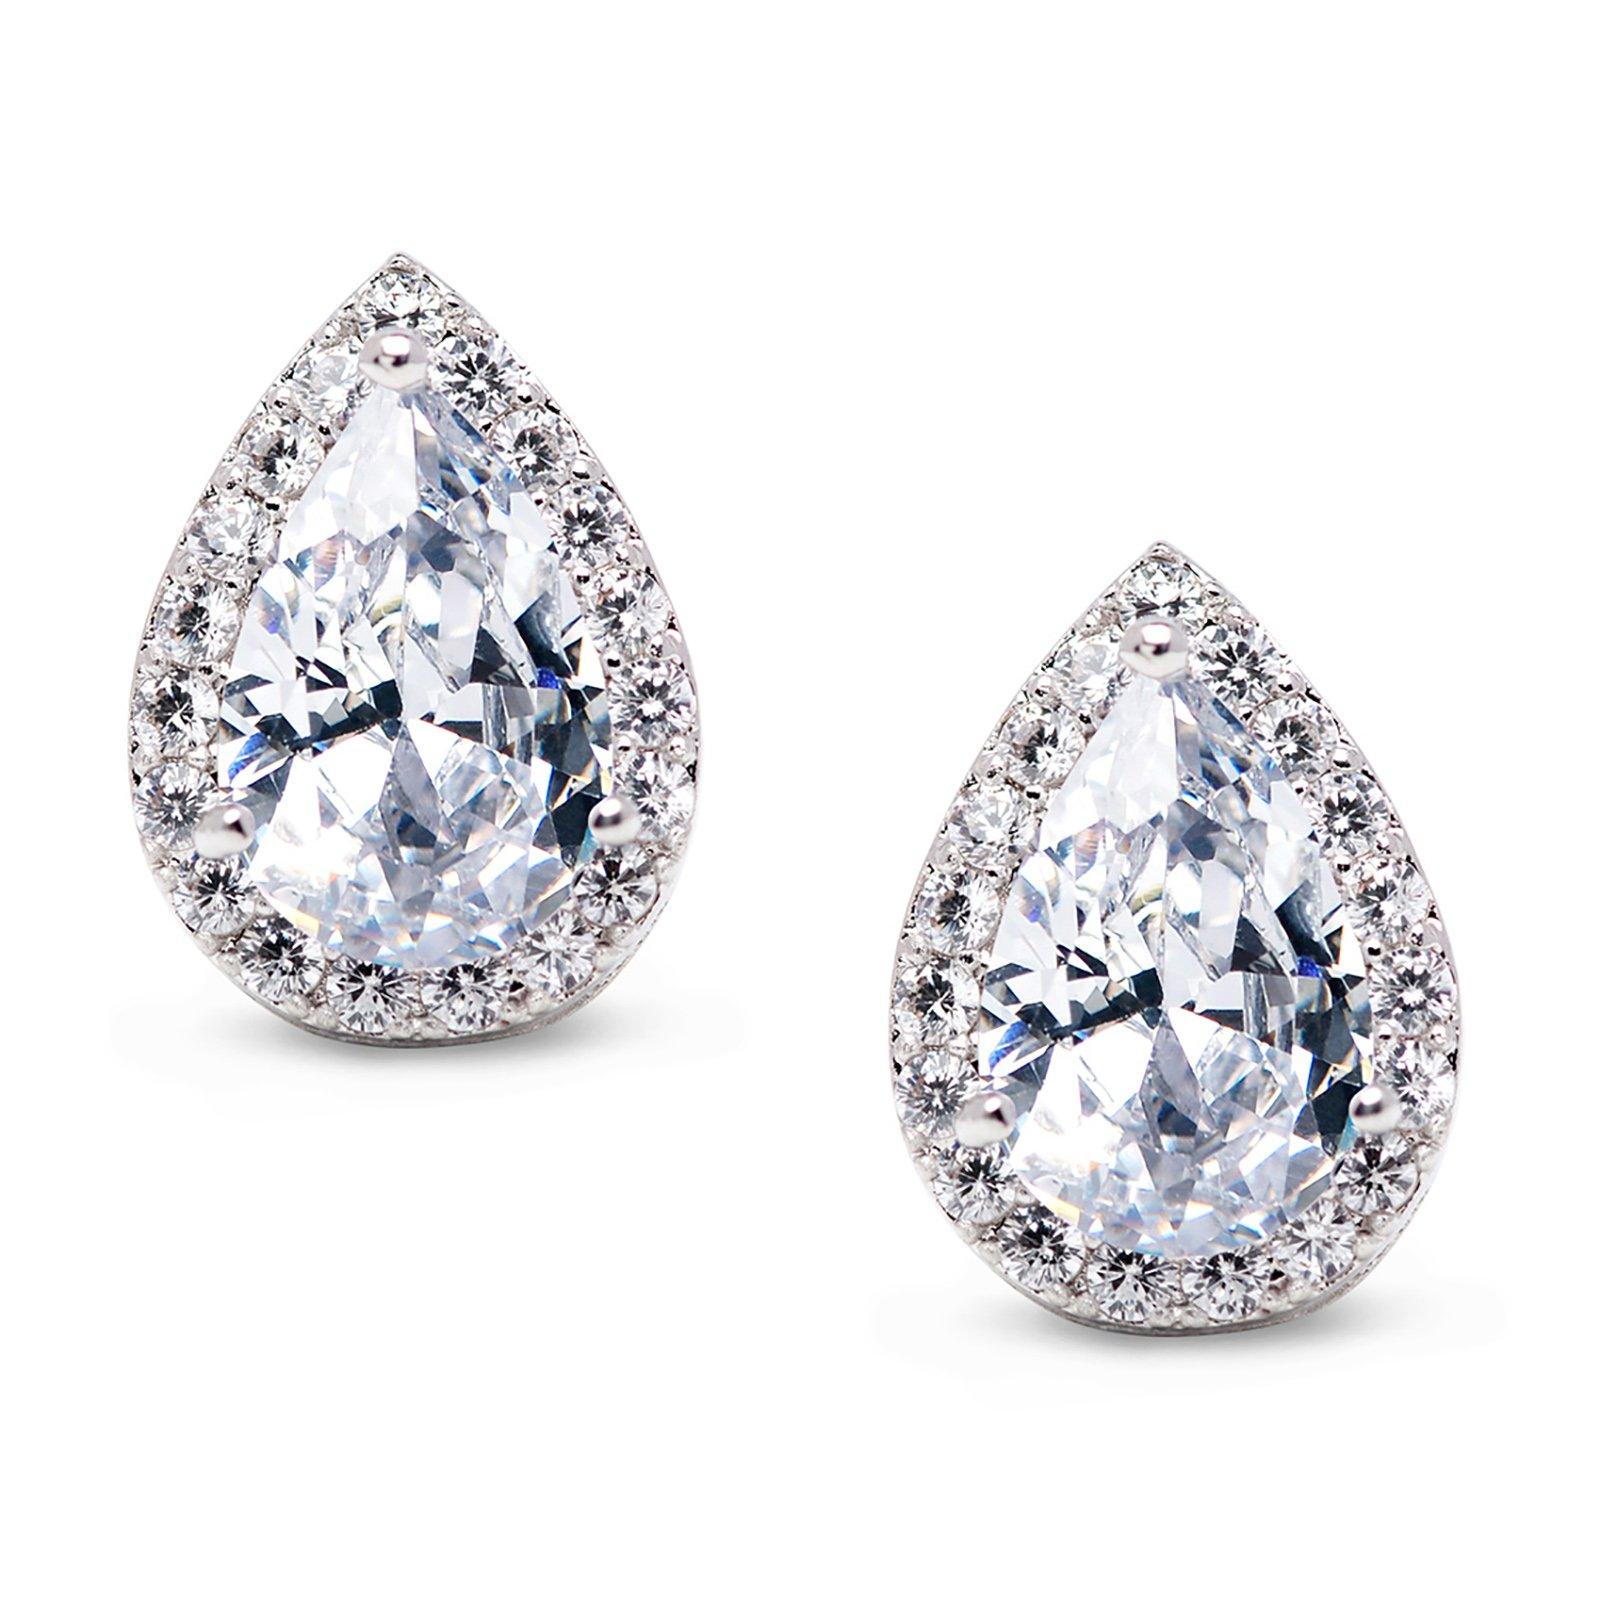 SWEETV Teardrop Bridal Earrings for Wedding, Prom - Elegant Cubic Zirconia Stud Earrings for women, brides, bridesmaids,Siver by SWEETV